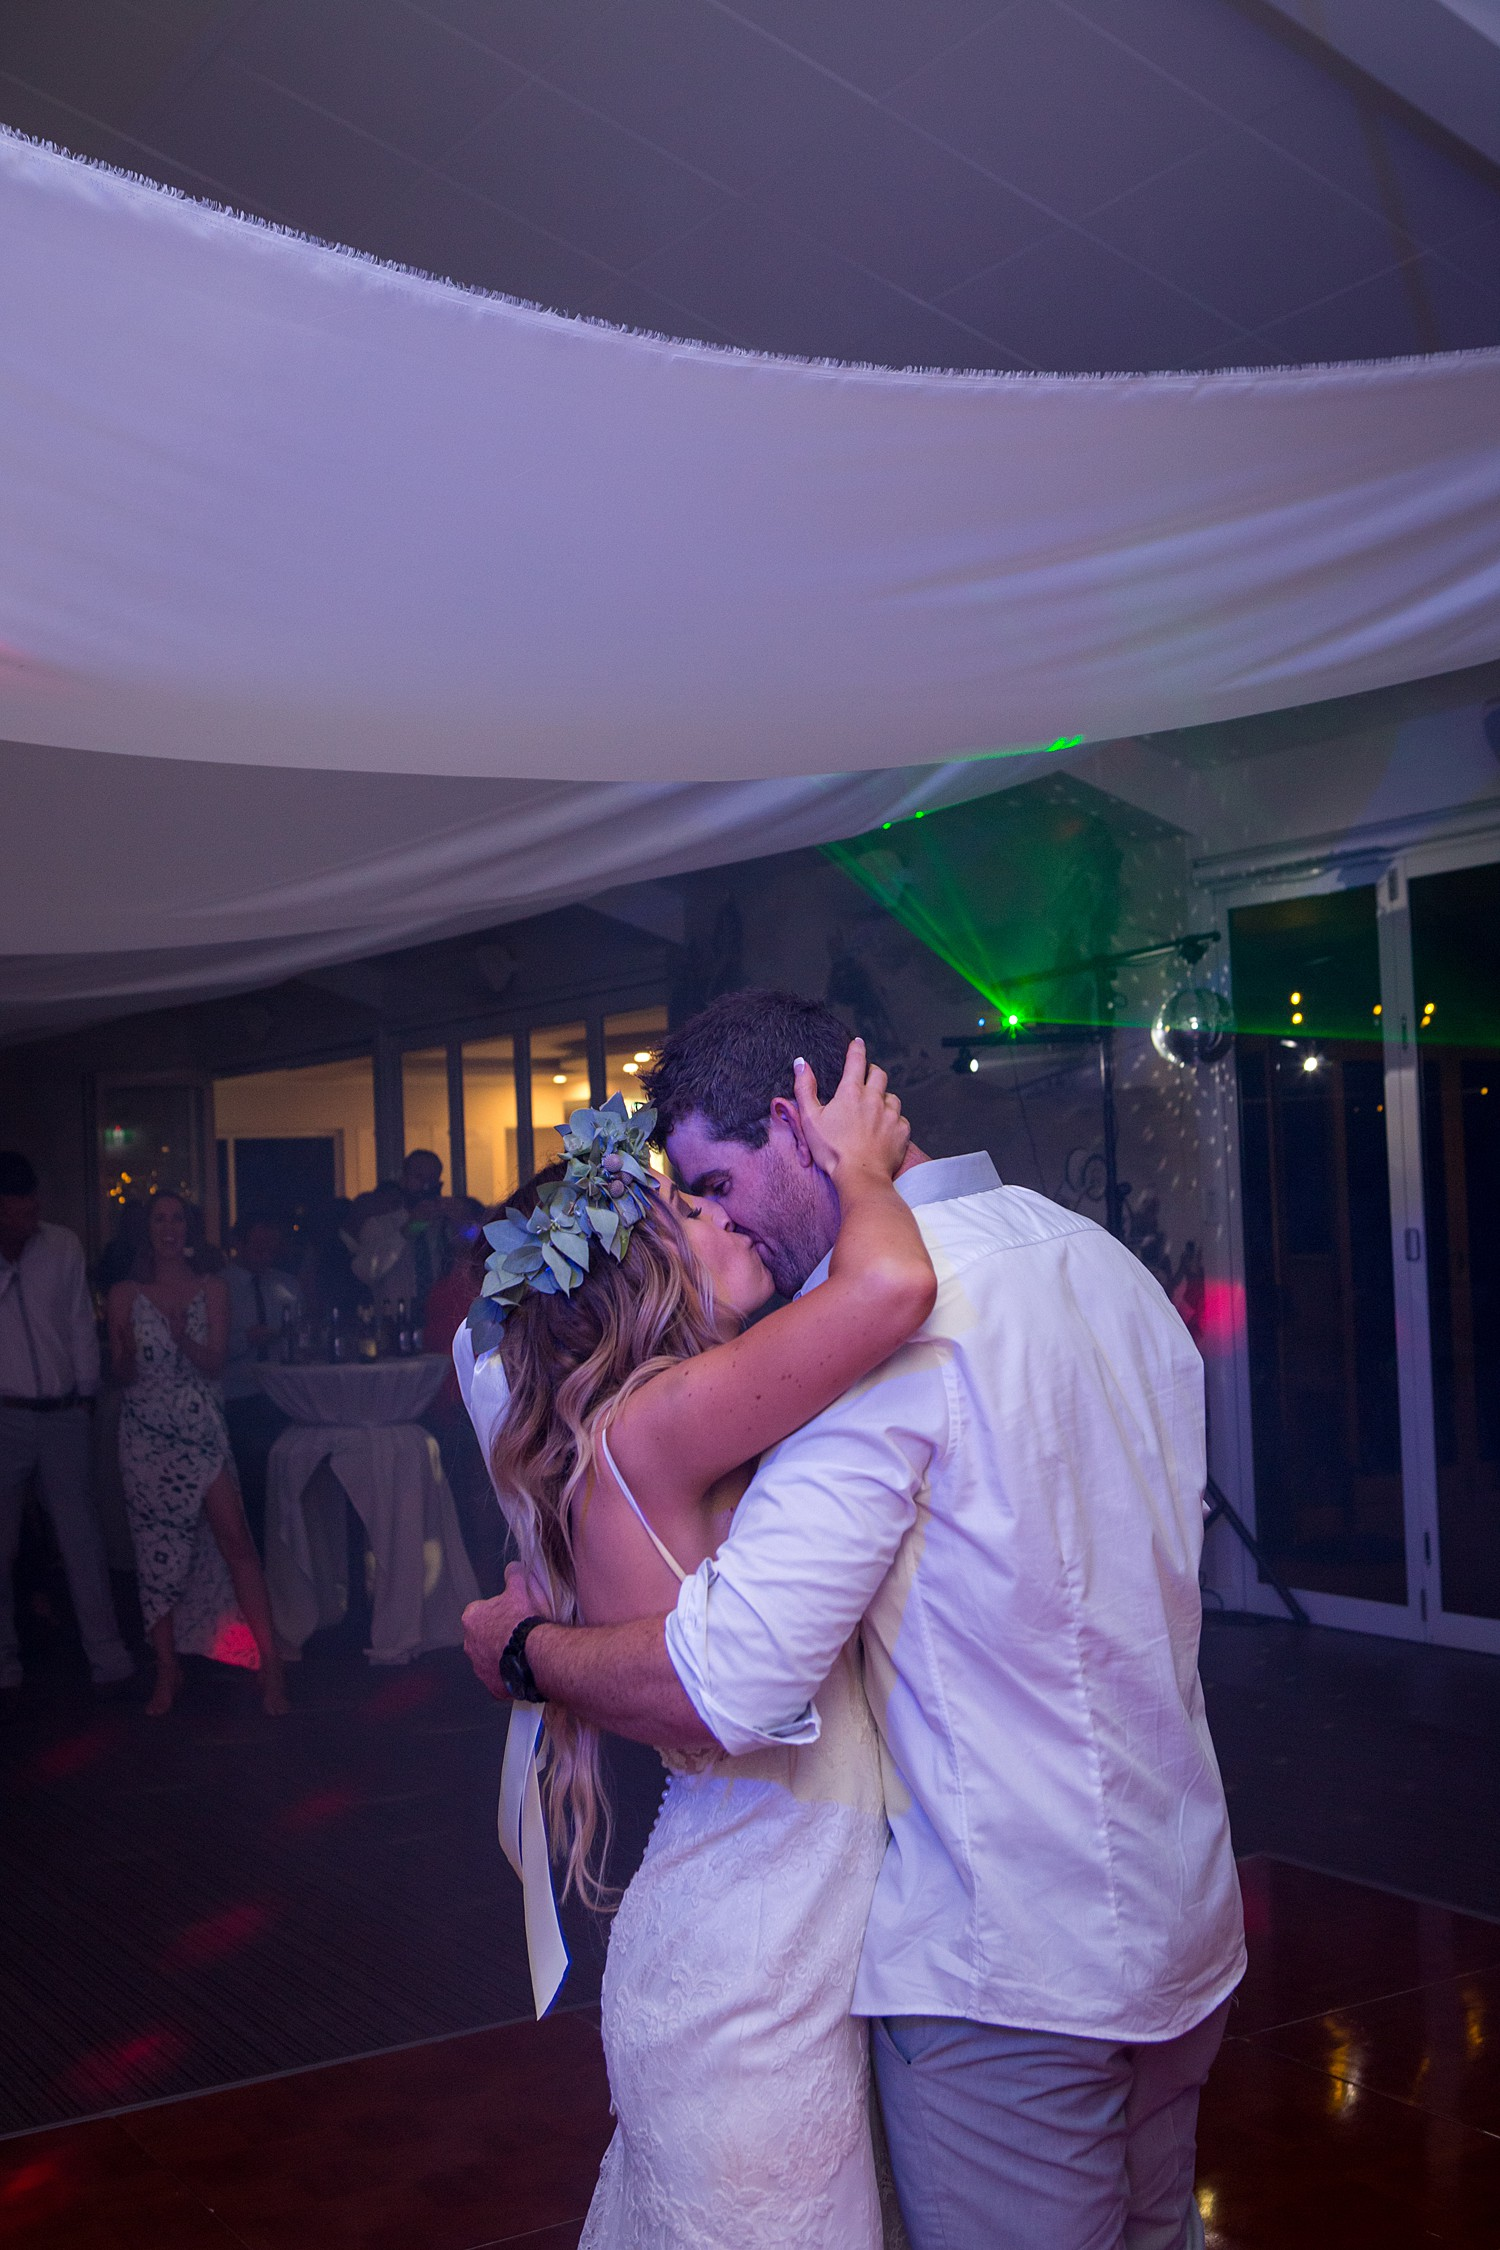 trigg_beach_wedding_perth (119).jpg